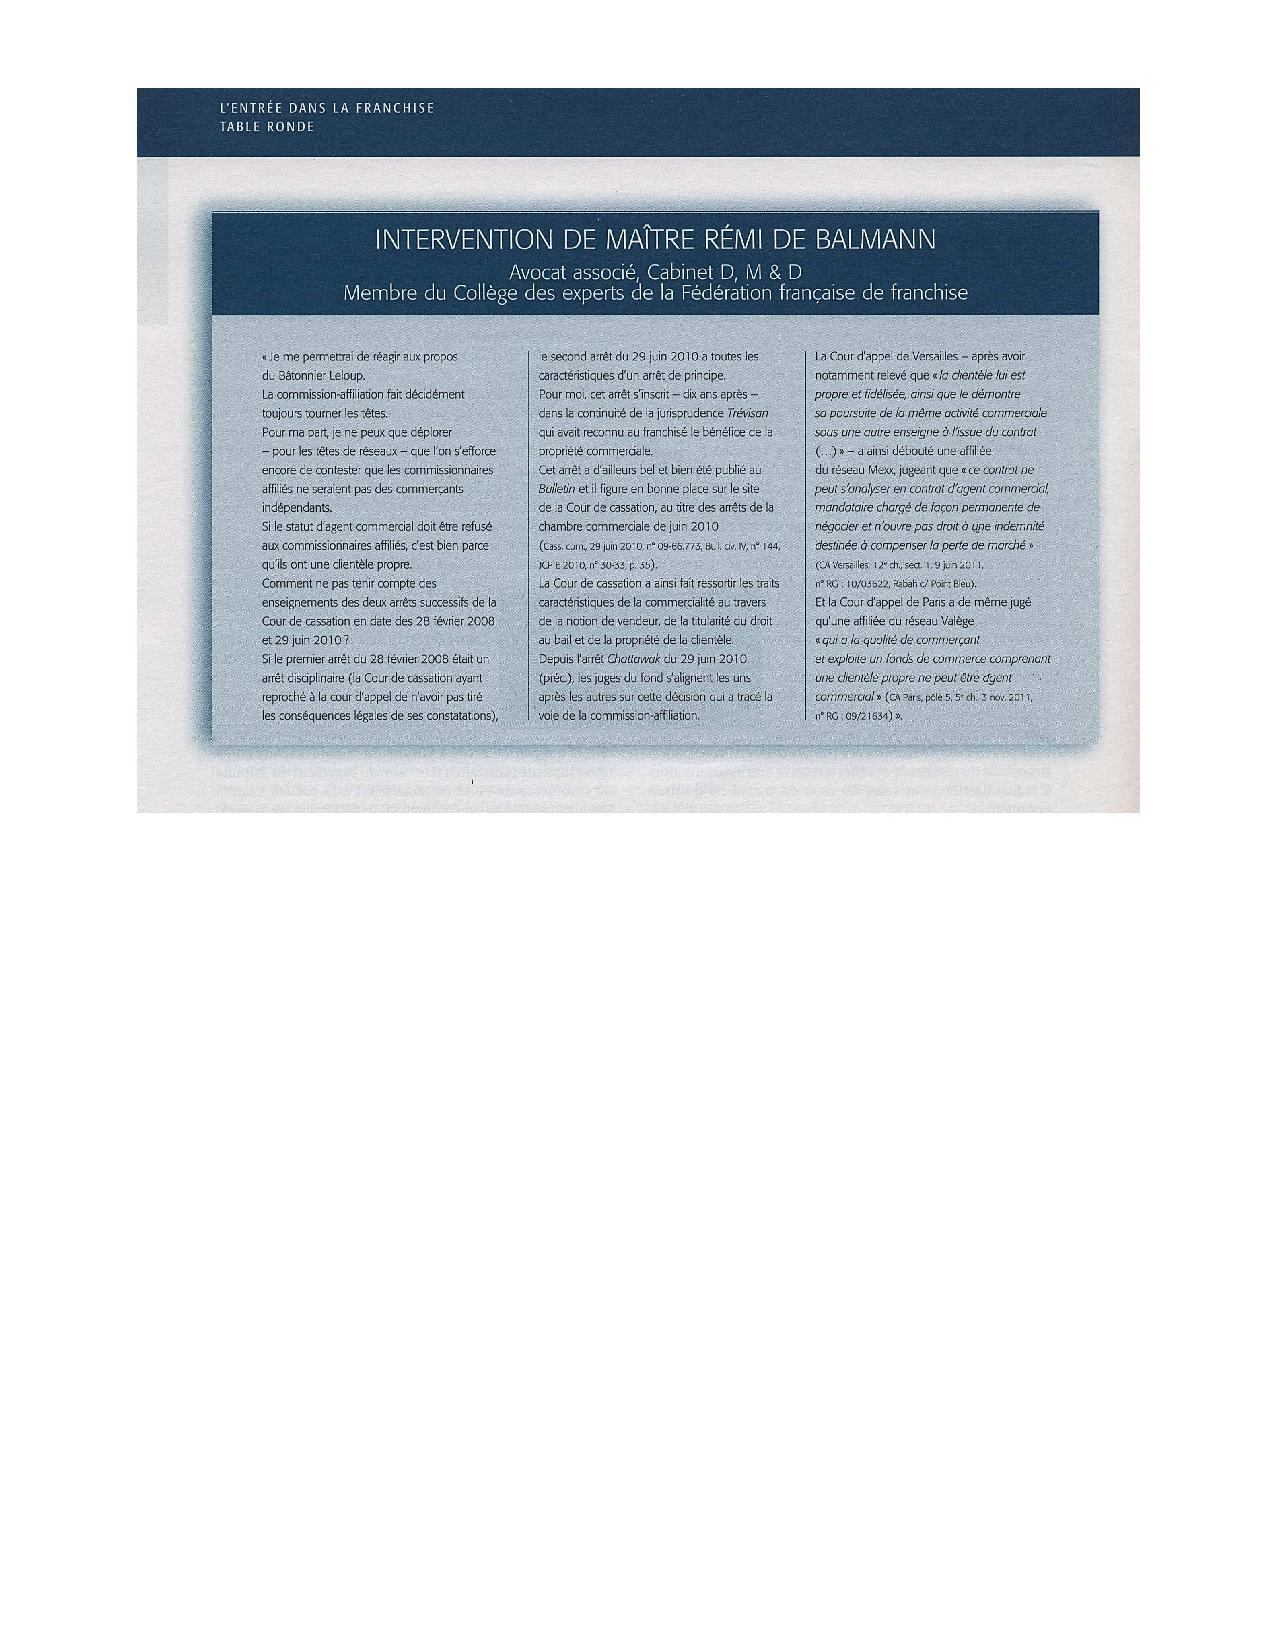 www.dmd-avocats.com_file...-cour-cassation-pdf